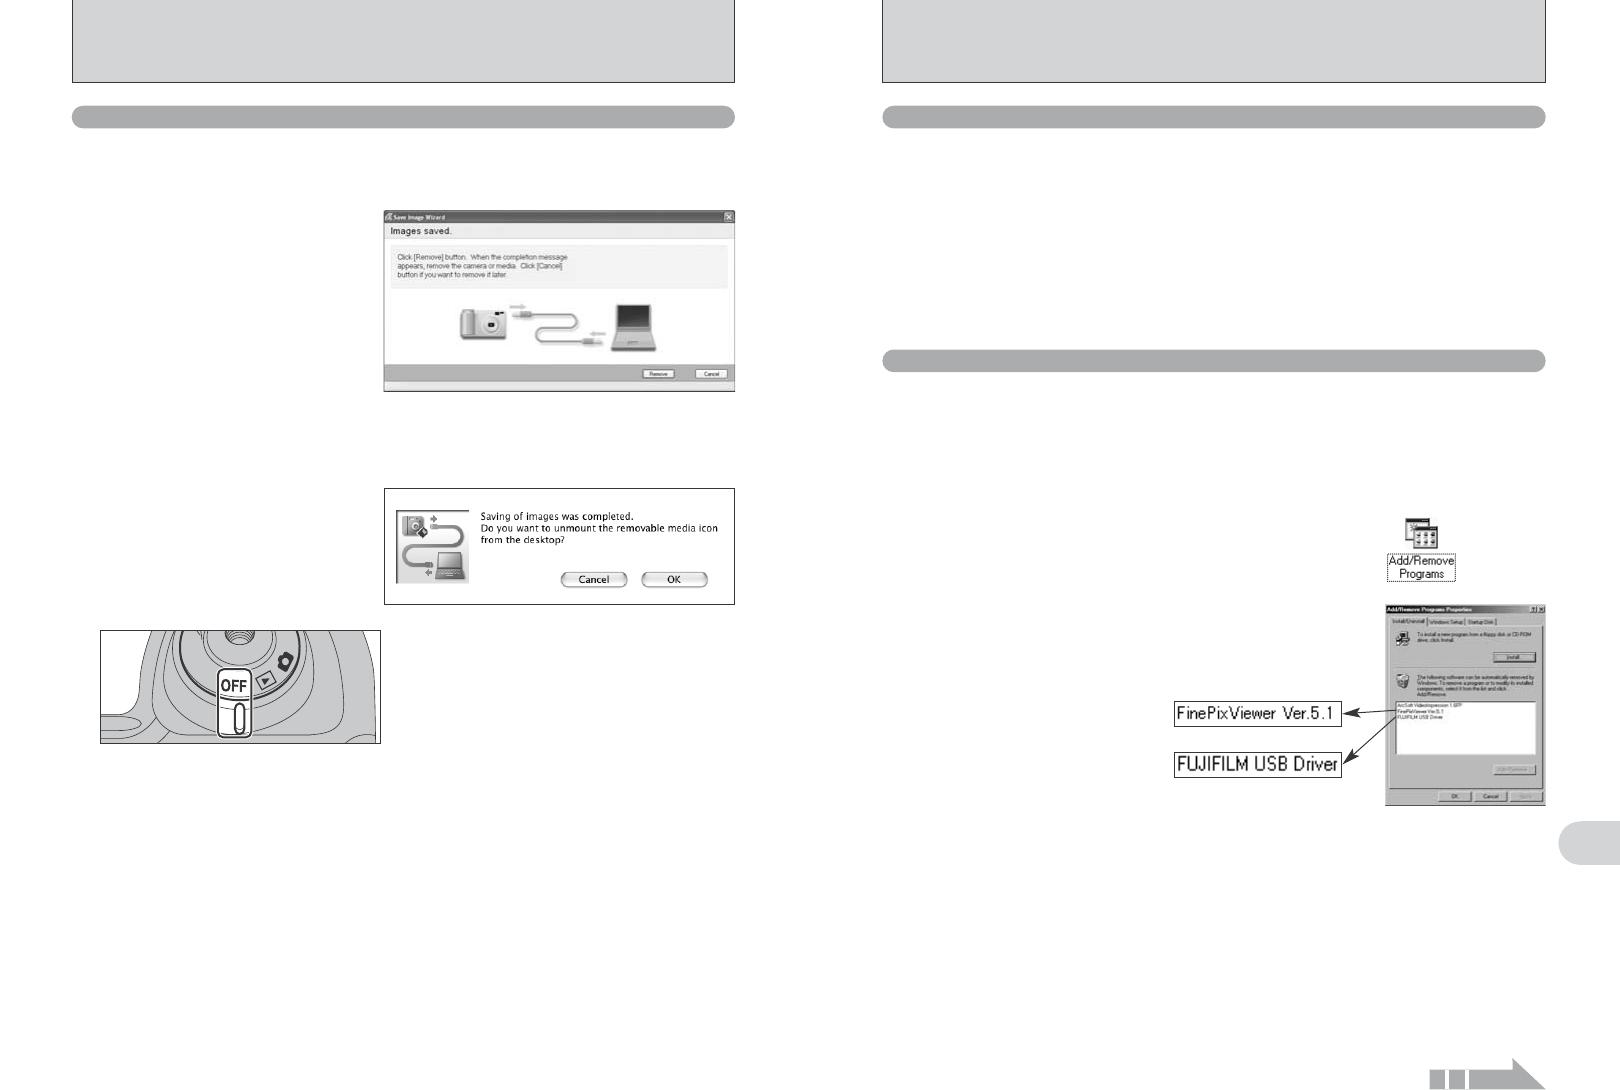 Handleiding Fujifilm Finepix S9500 (pagina 62 van 73) (English)